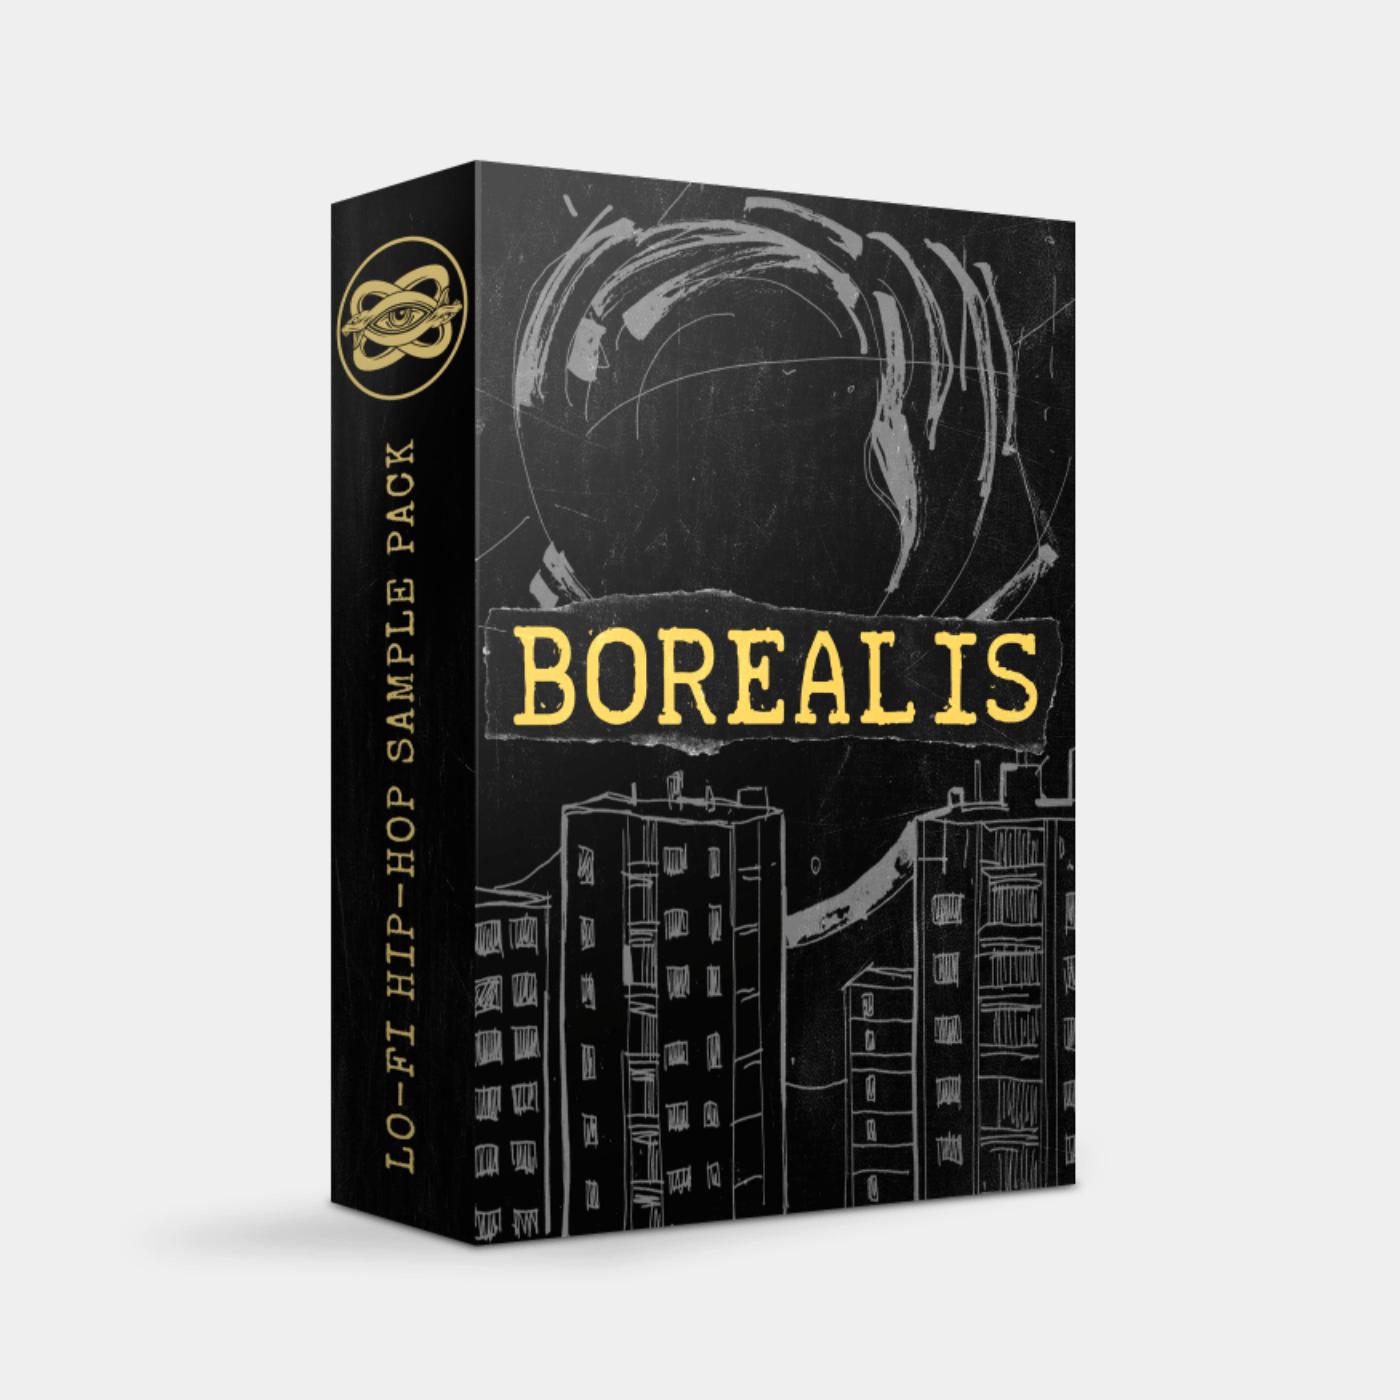 Borealis Lofi Hip Hop Sample Pack